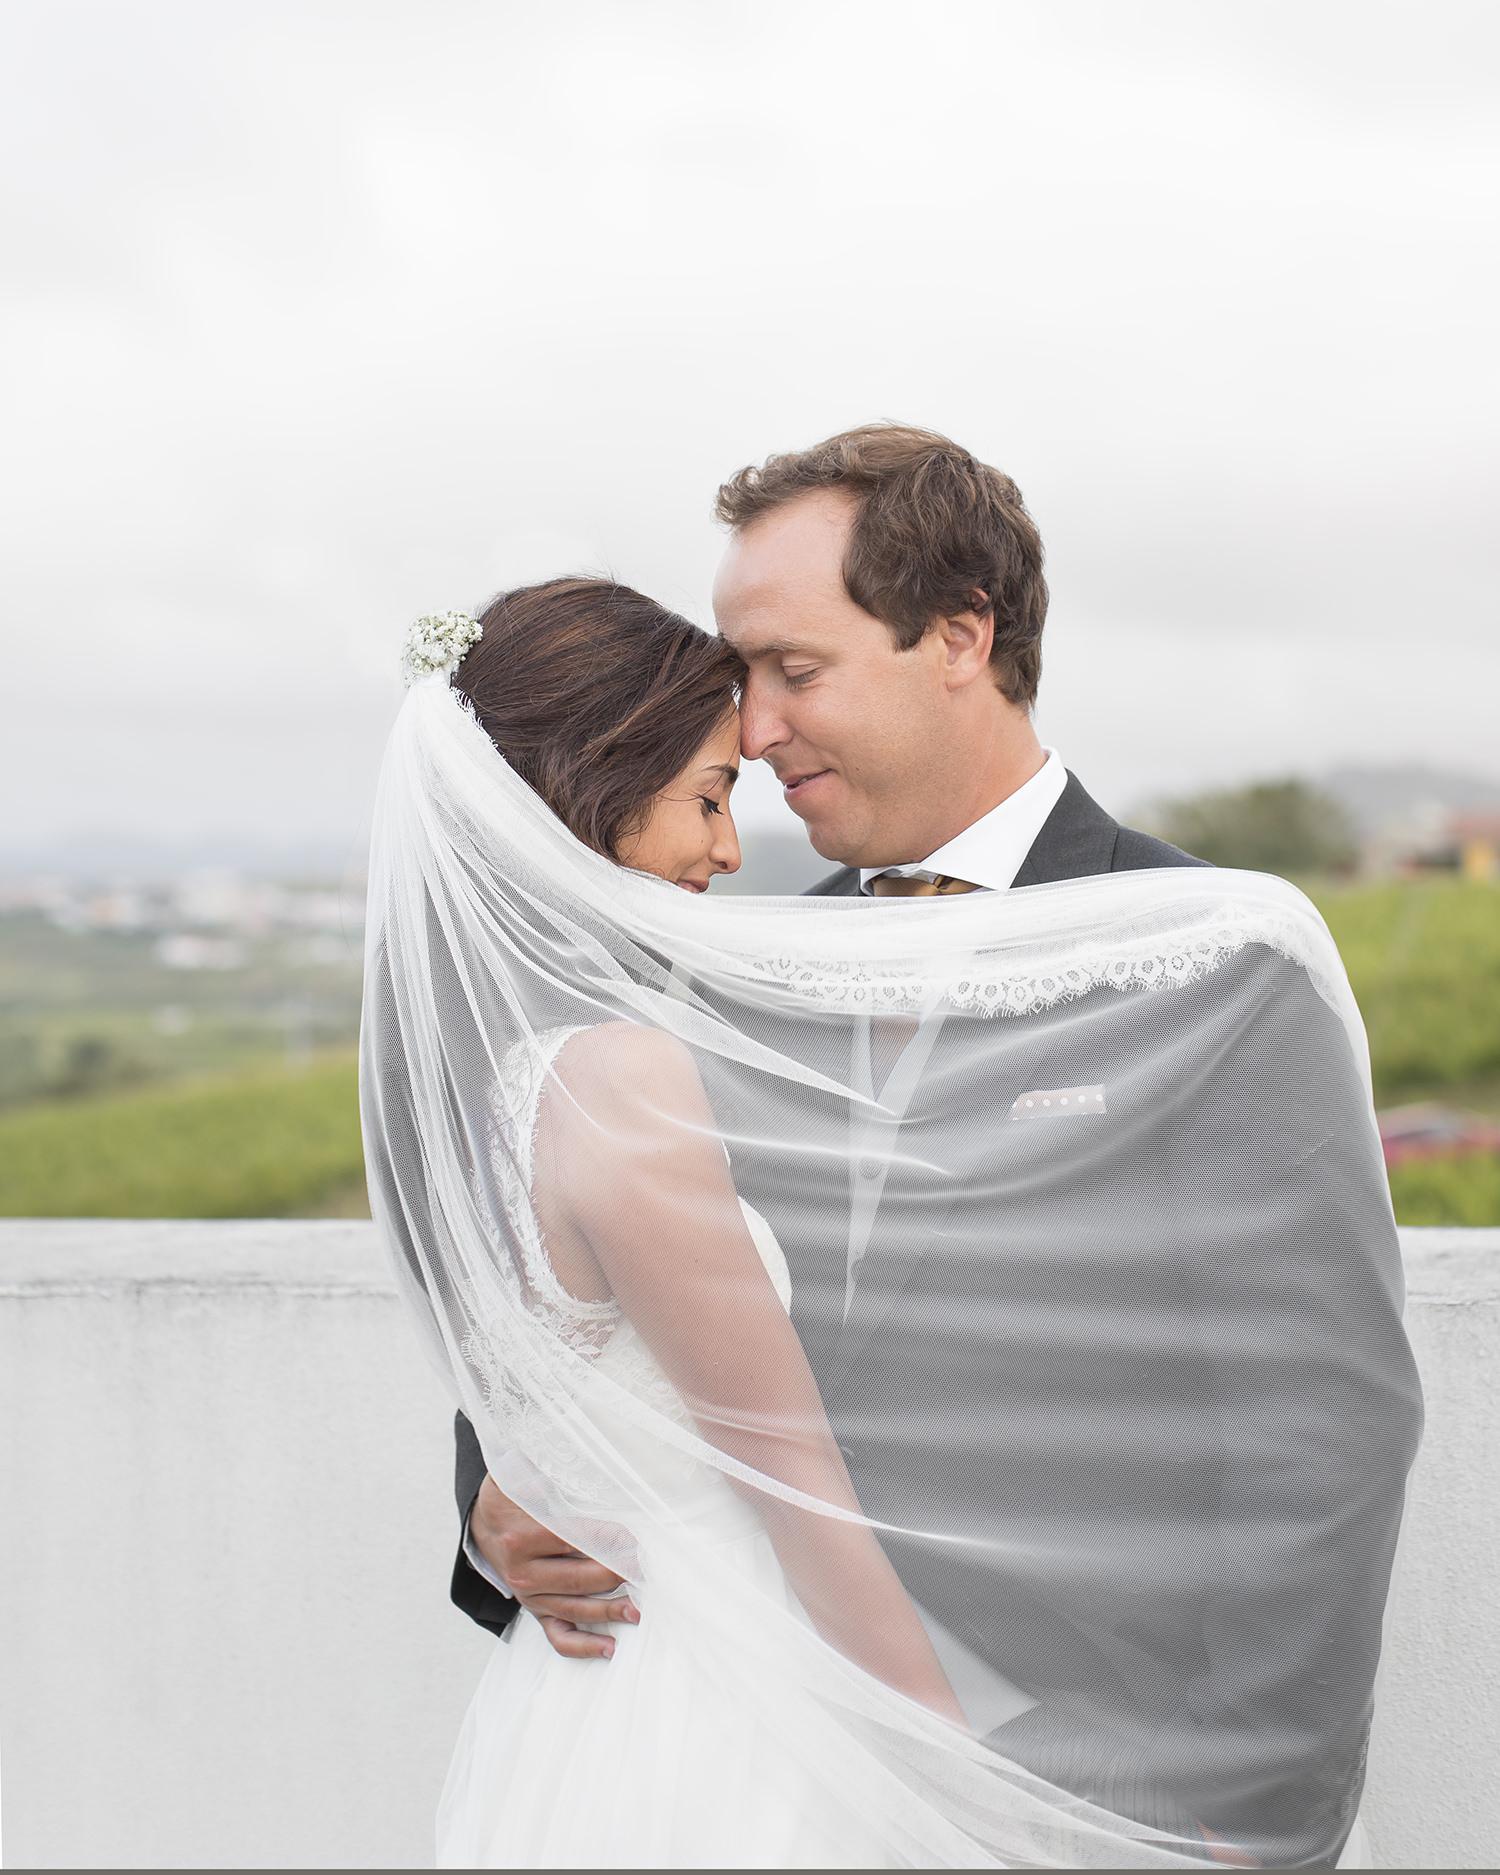 areias-seixo-wedding-photographer-terra-fotografia-161.jpg